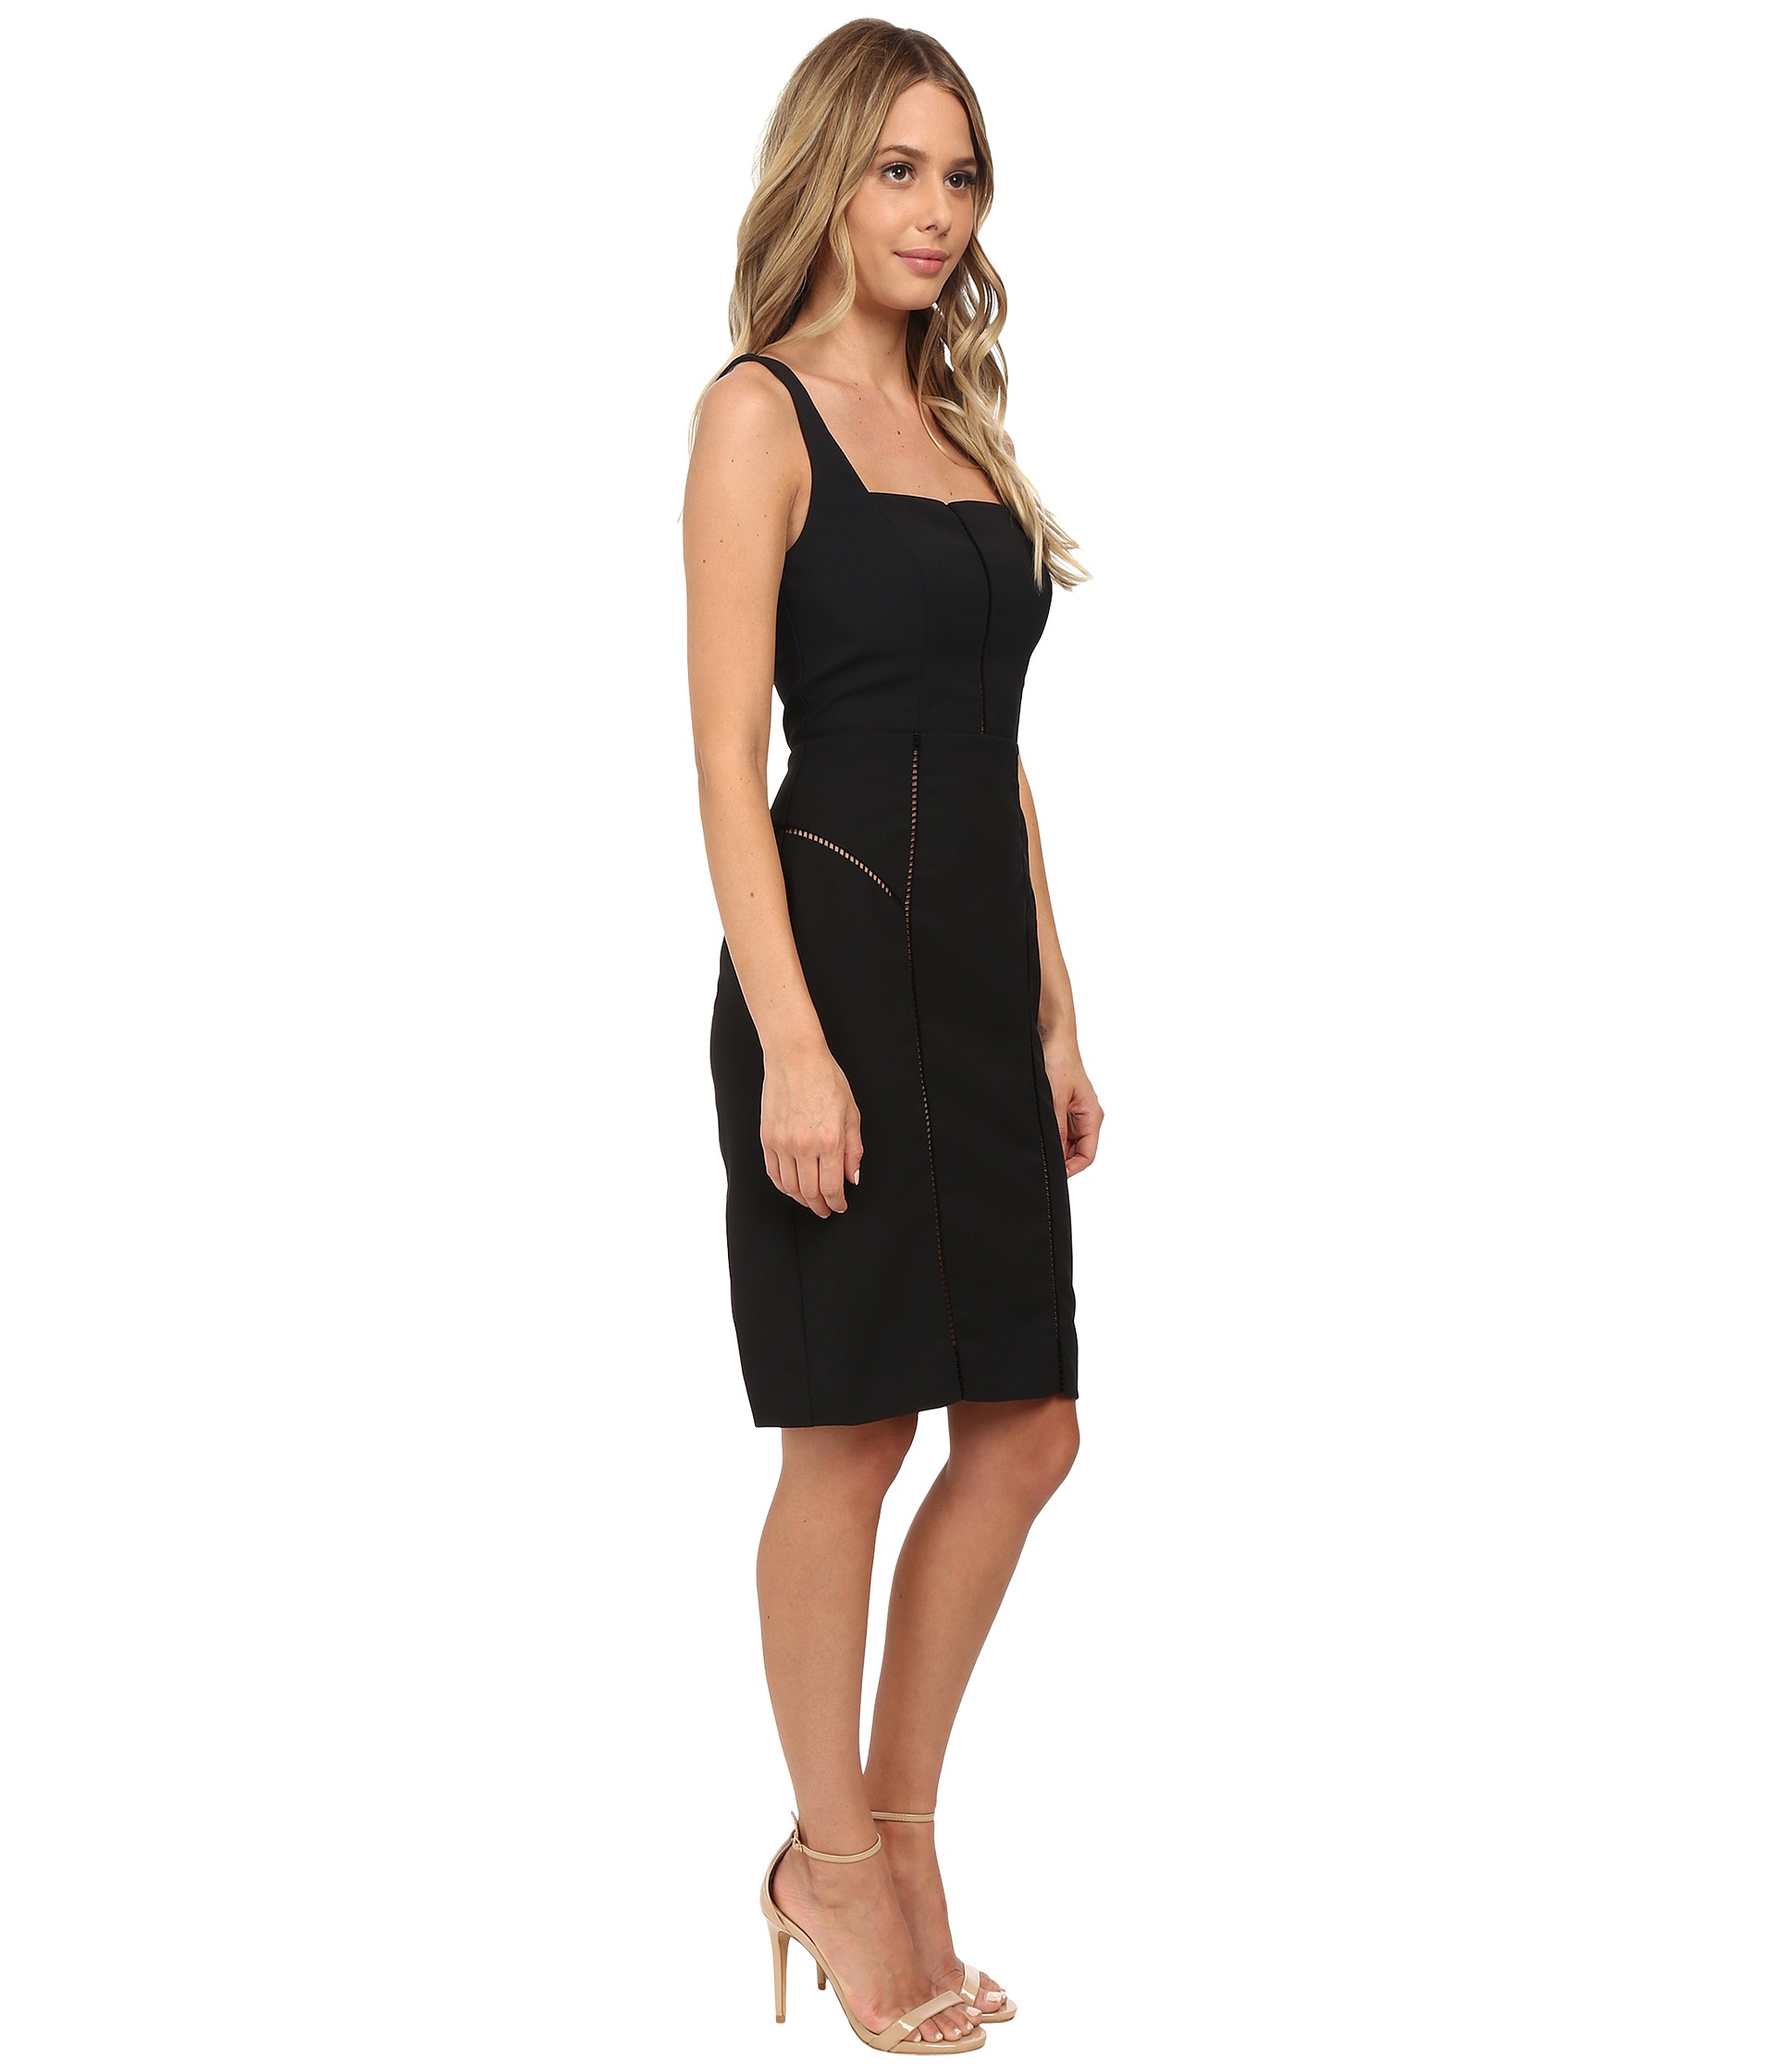 Lyst Nicole Miller Alaiya Square Neck Cocktail Dress In Black